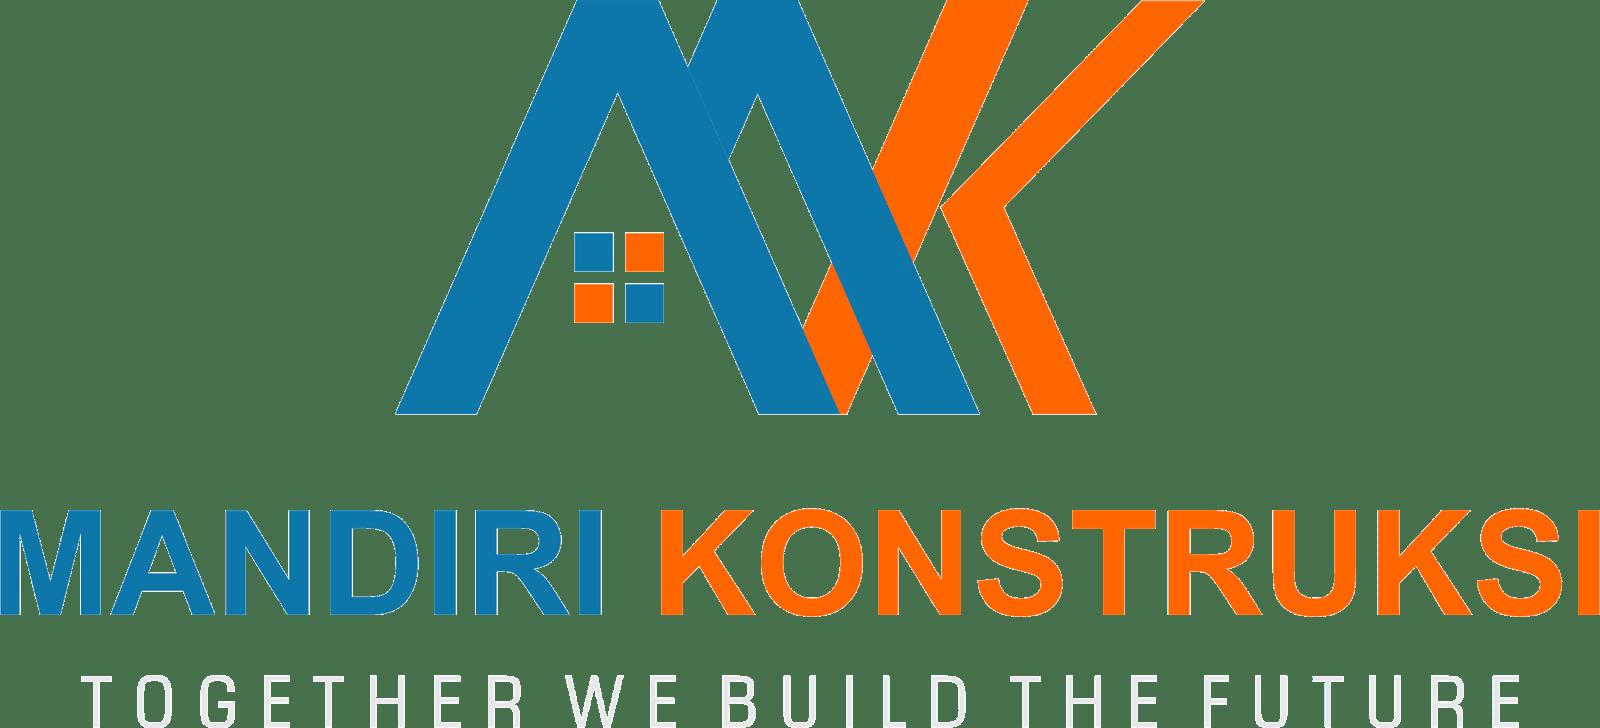 Lowongan Kerja Di Cv Mandiri Konstruksi Yogyakarta Arsitek Sipil Pengawas Lapangan Marketing Portal Info Lowongan Kerja Jogja Yogyakarta 2021